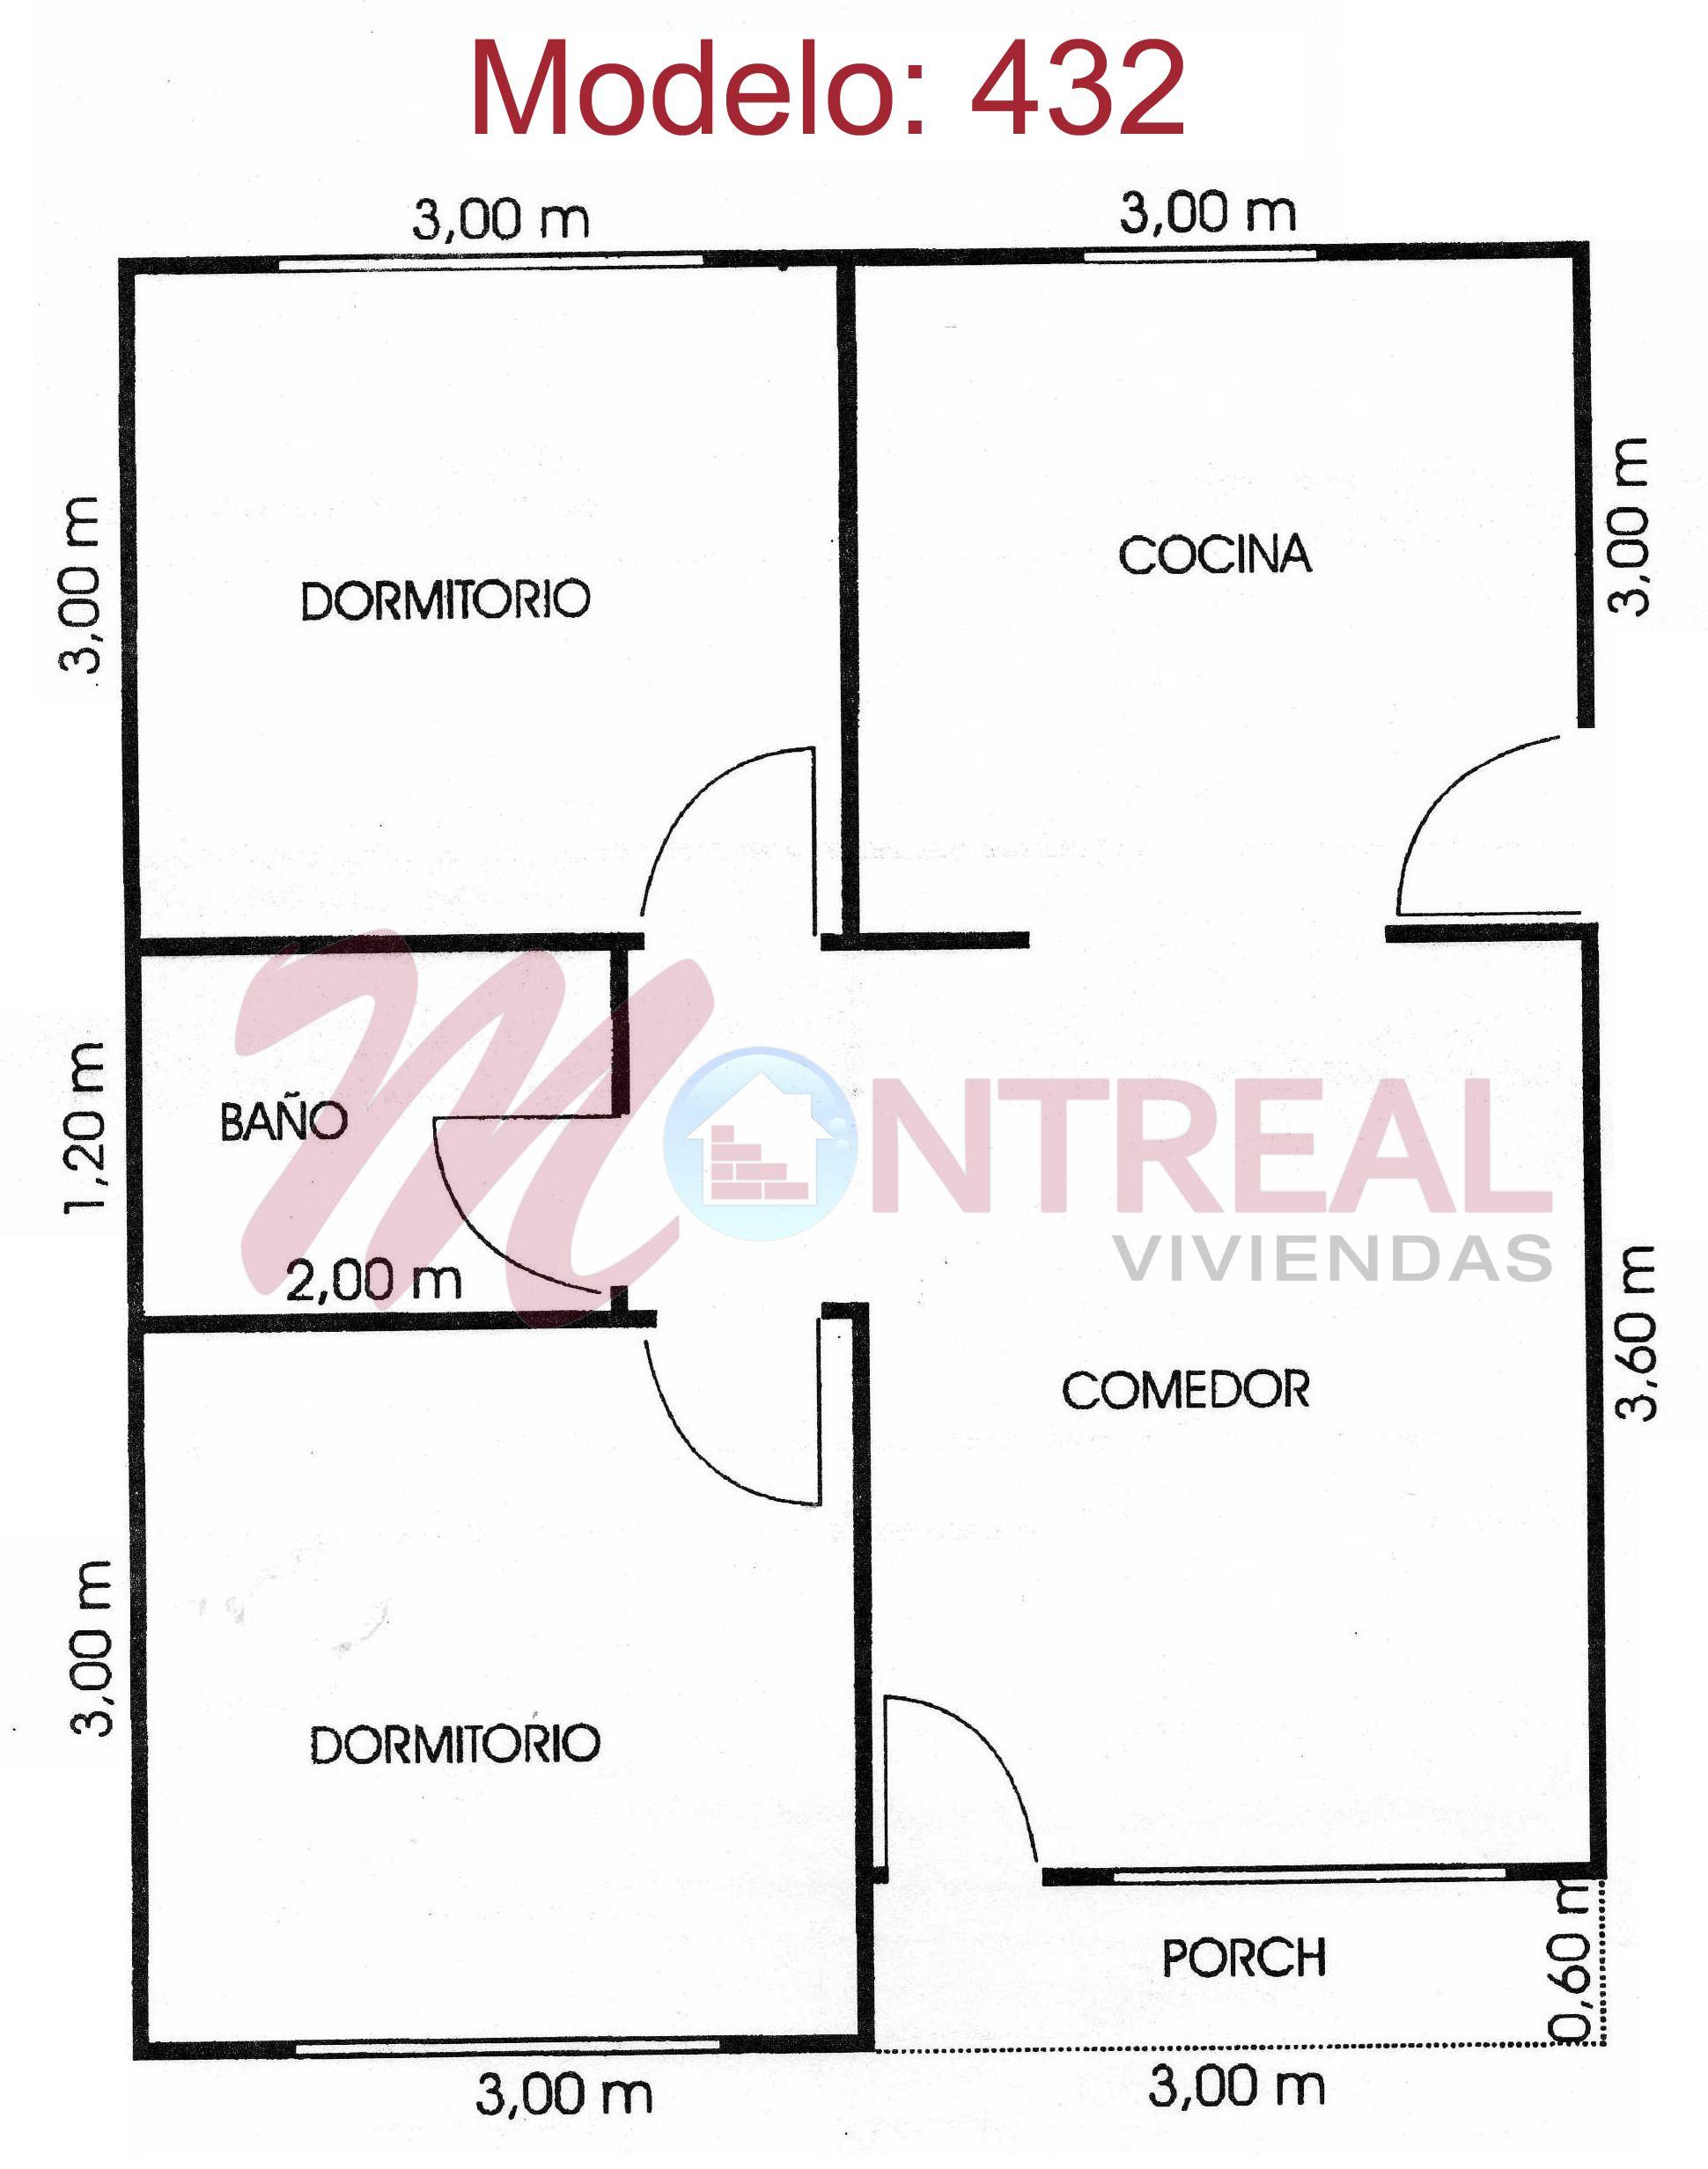 Plano modelo 432 planos pinterest planos modelo y - Planos de viviendas ...